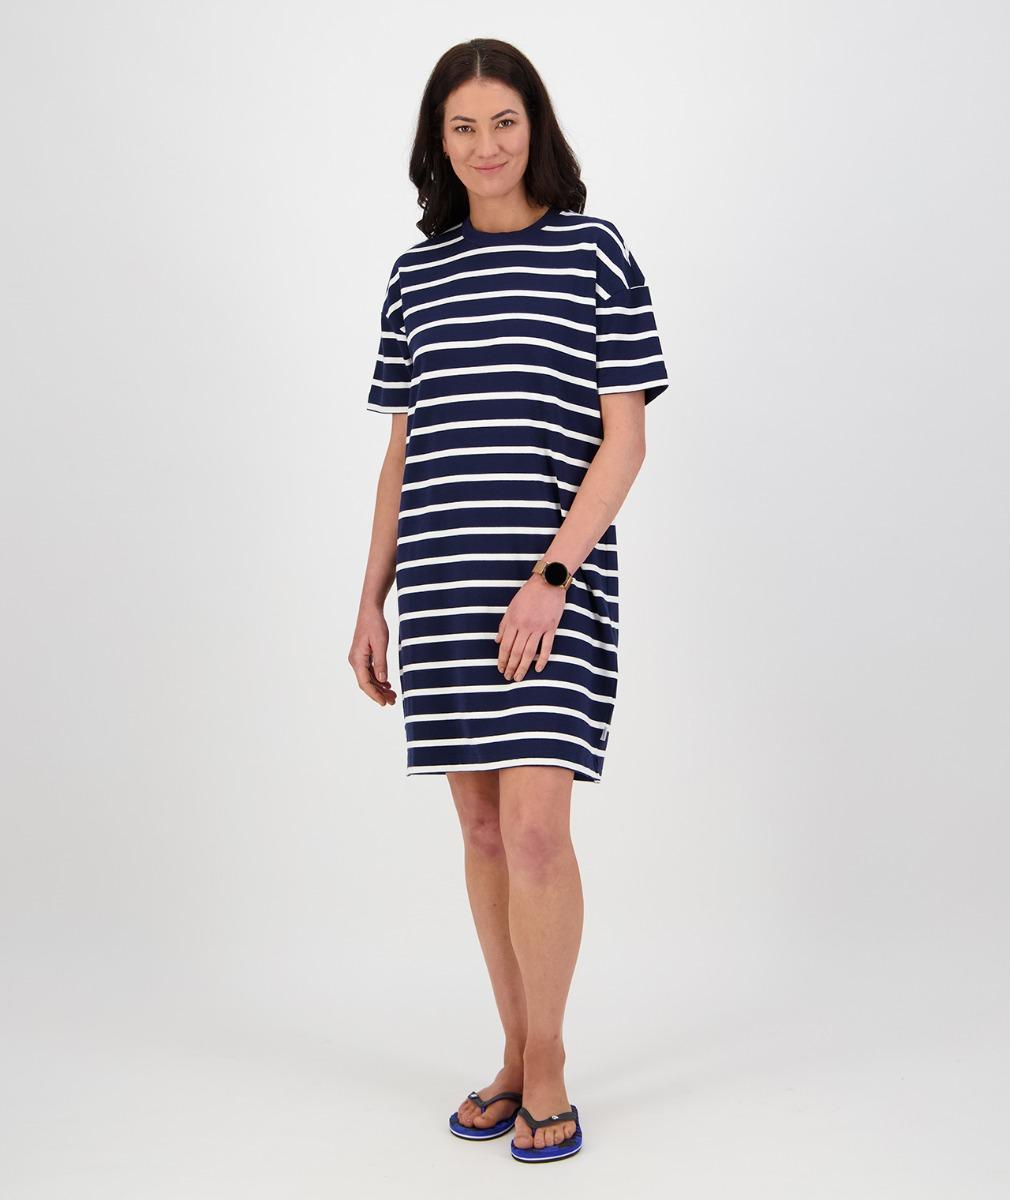 Swanndri Women's Acacia Stripe Dress in Navy/White